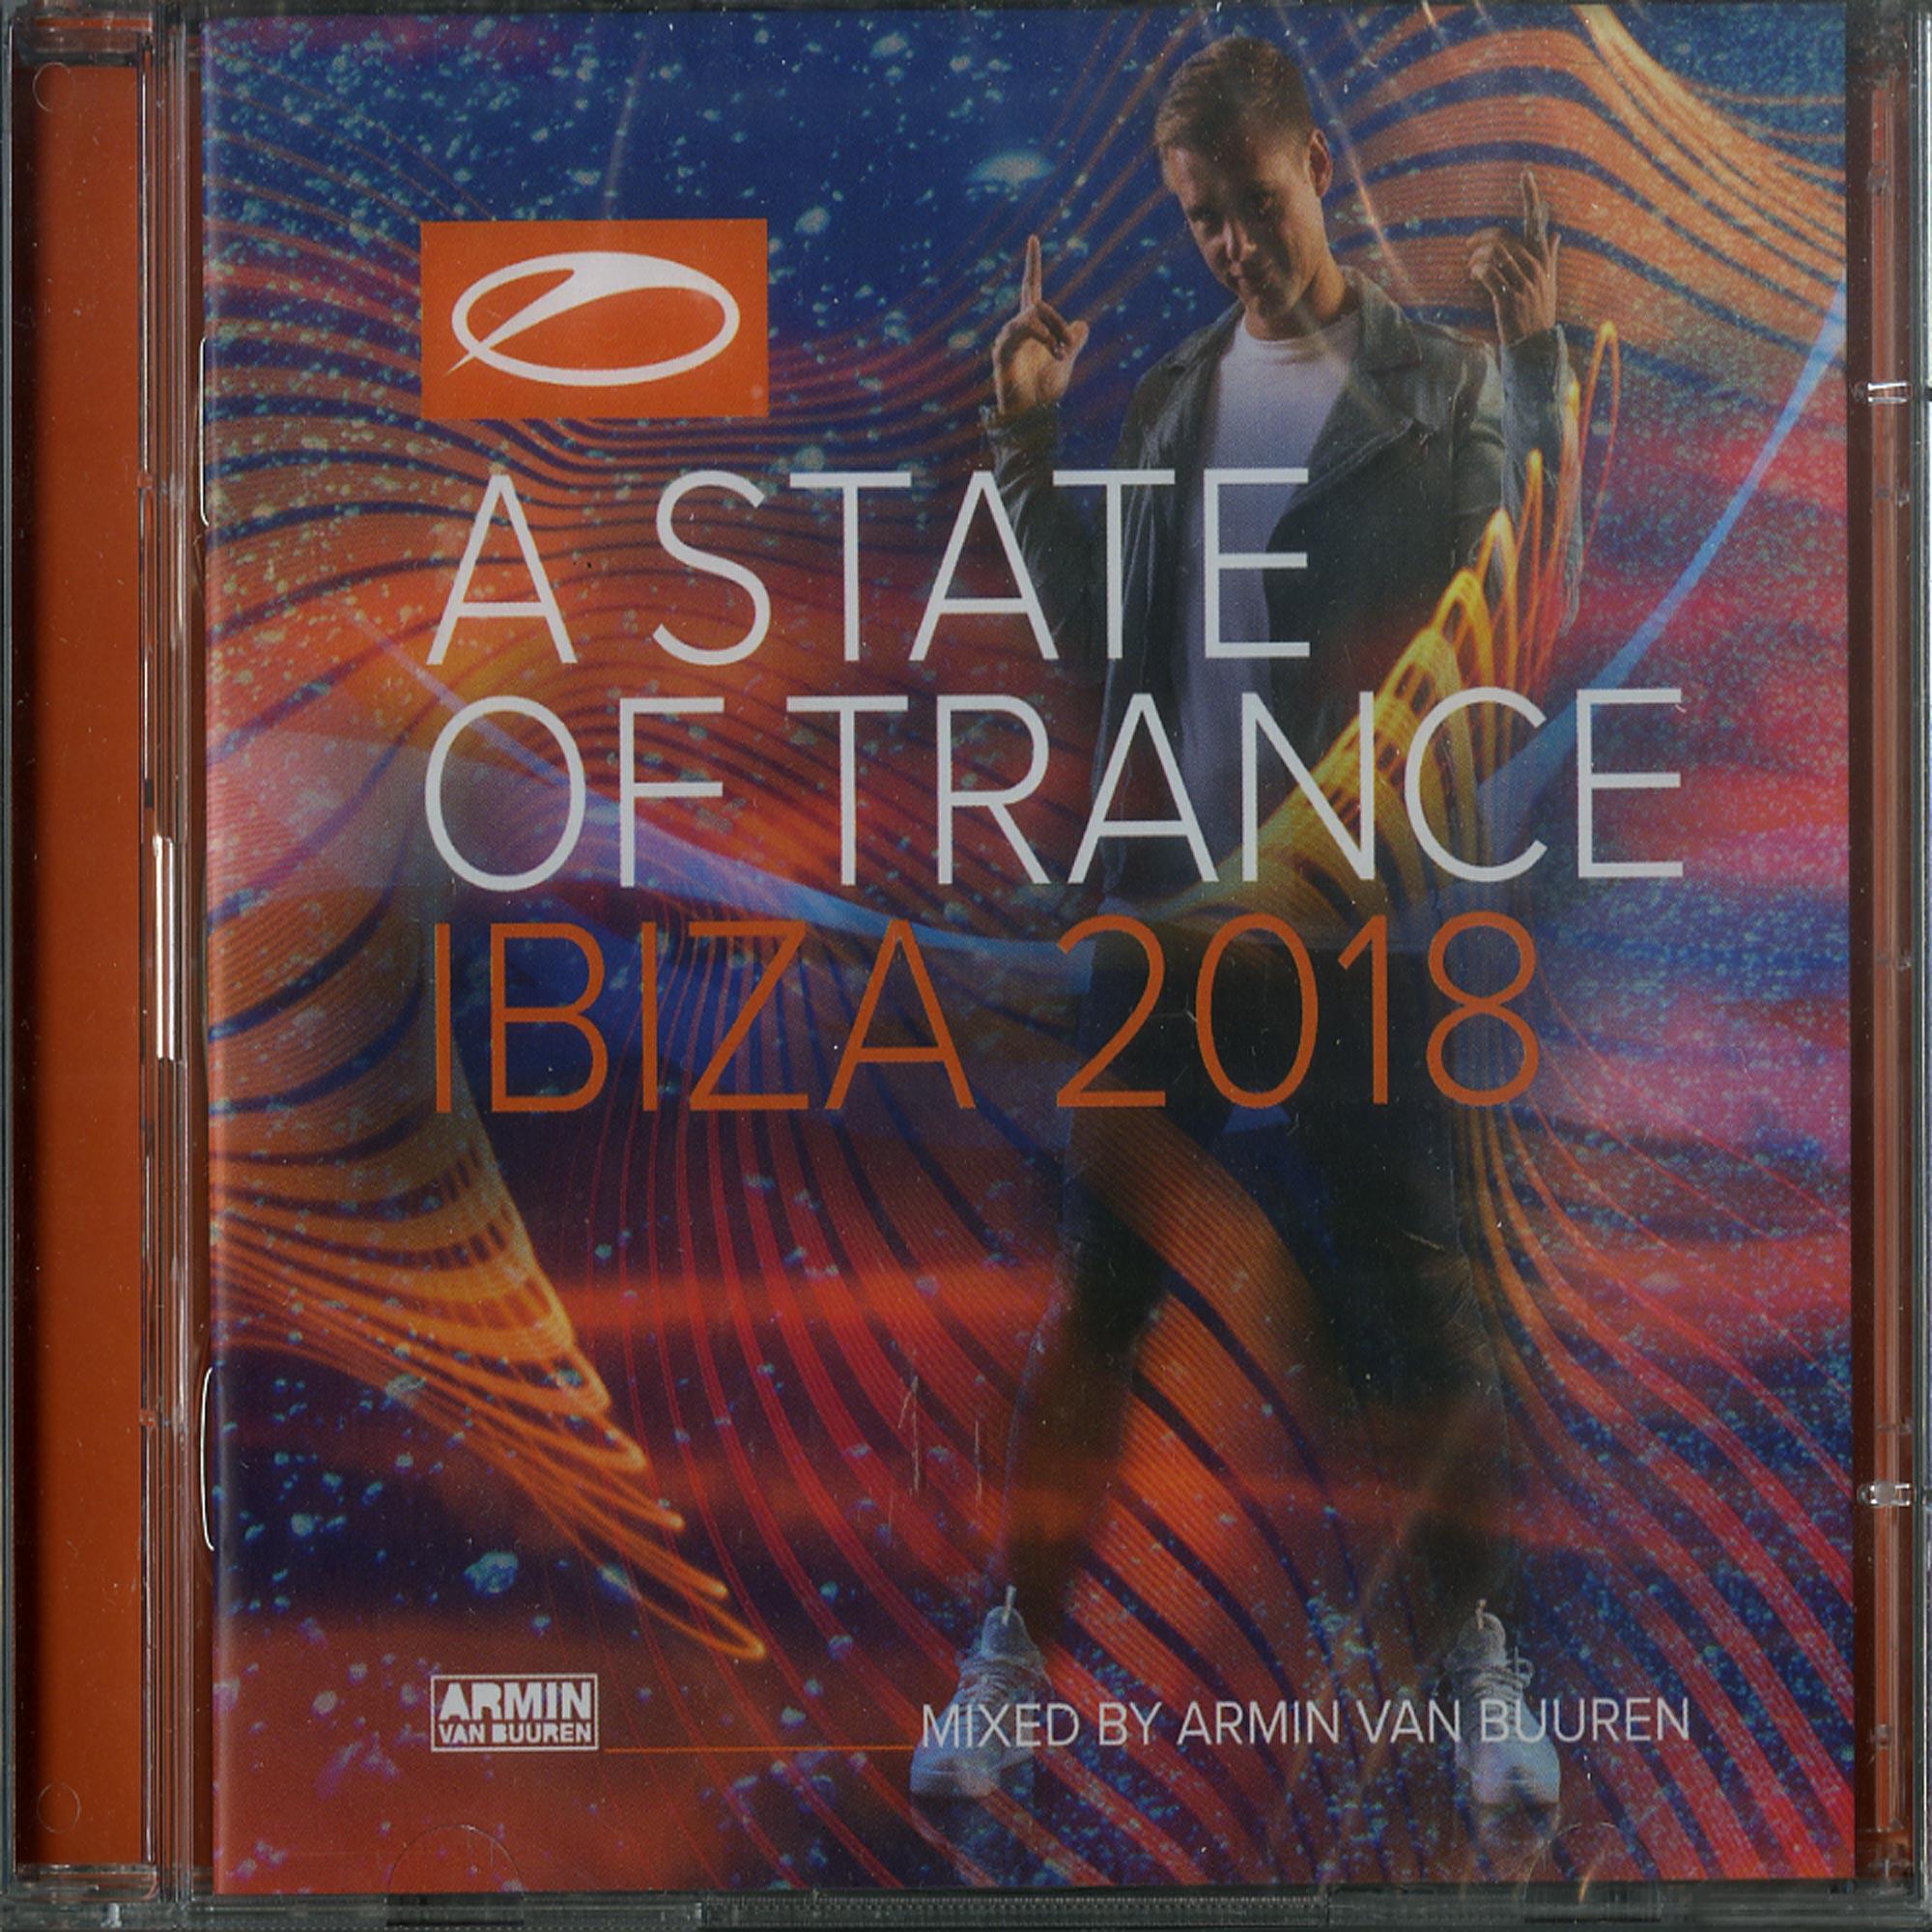 Armin Van Buuren - A STATE OF TRANCE - IBIZA 2018